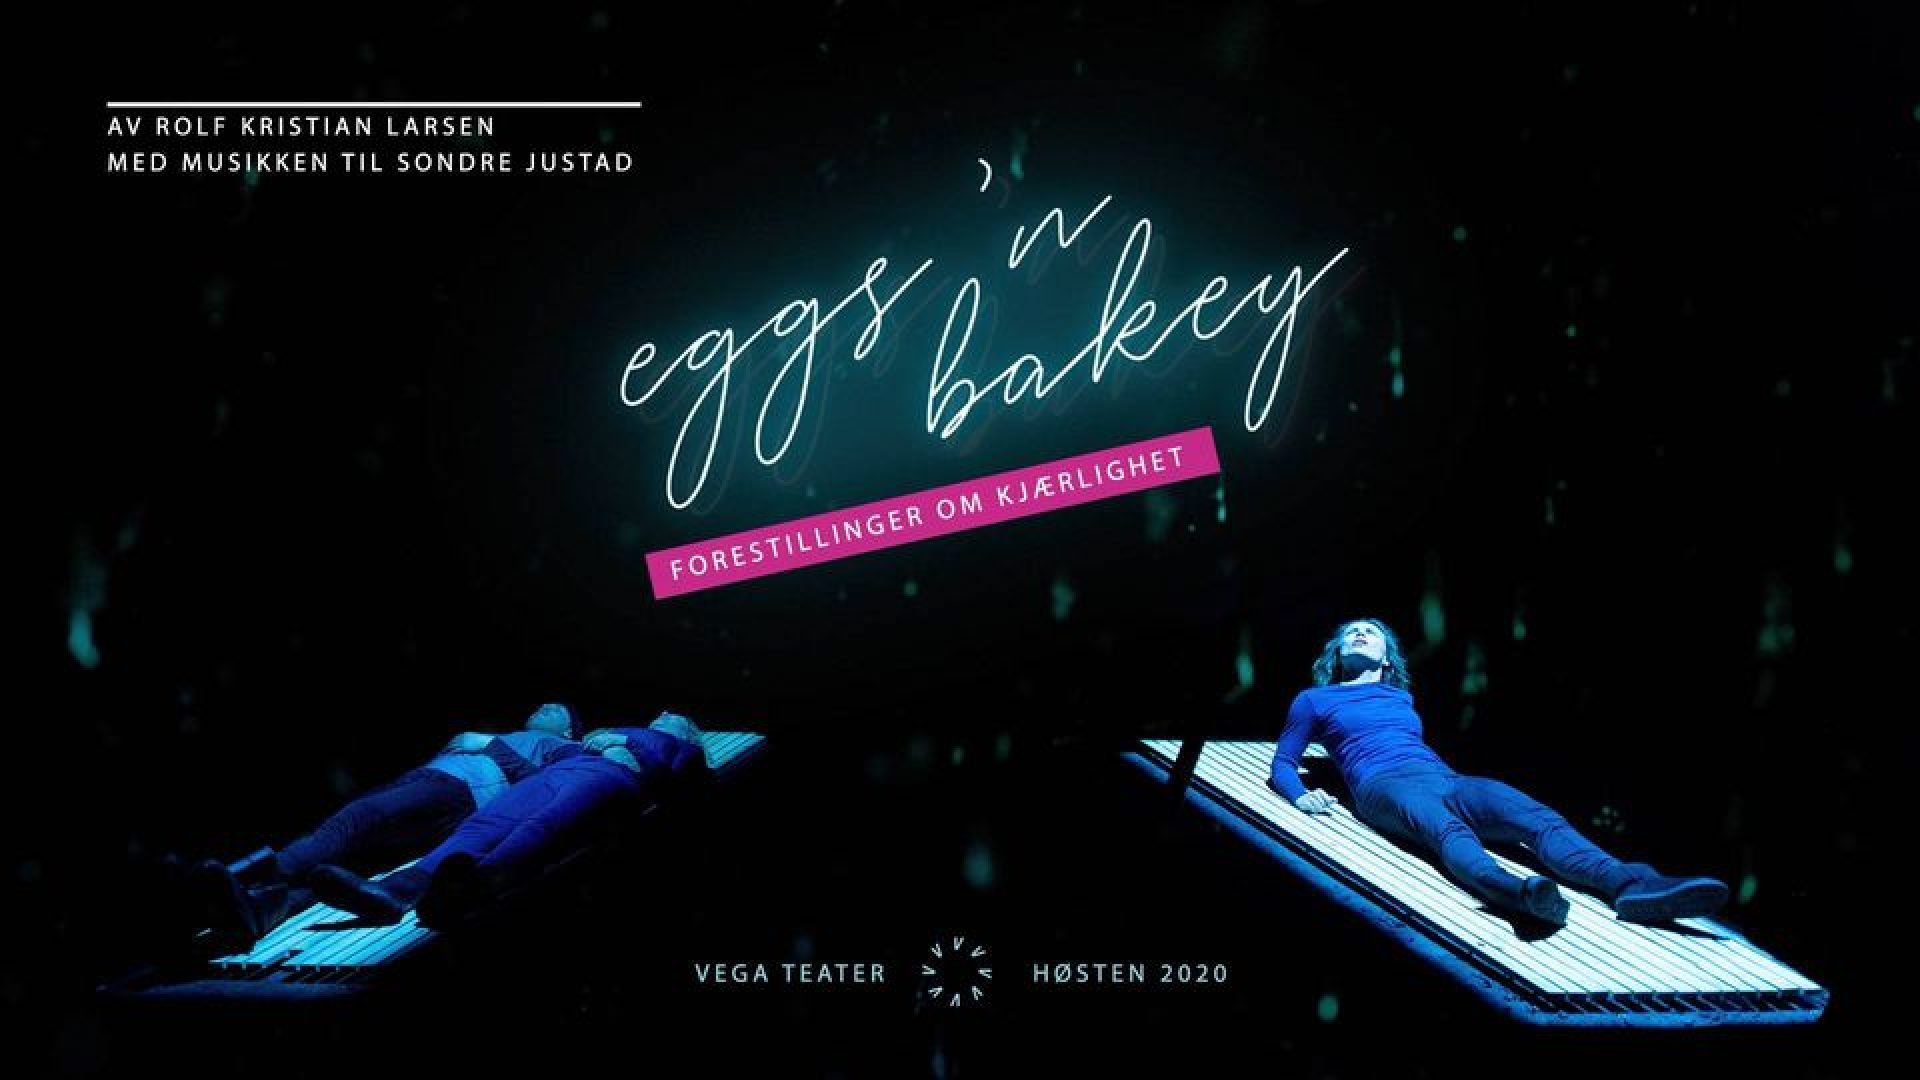 Nordland Teater: Eggs'n Bakey